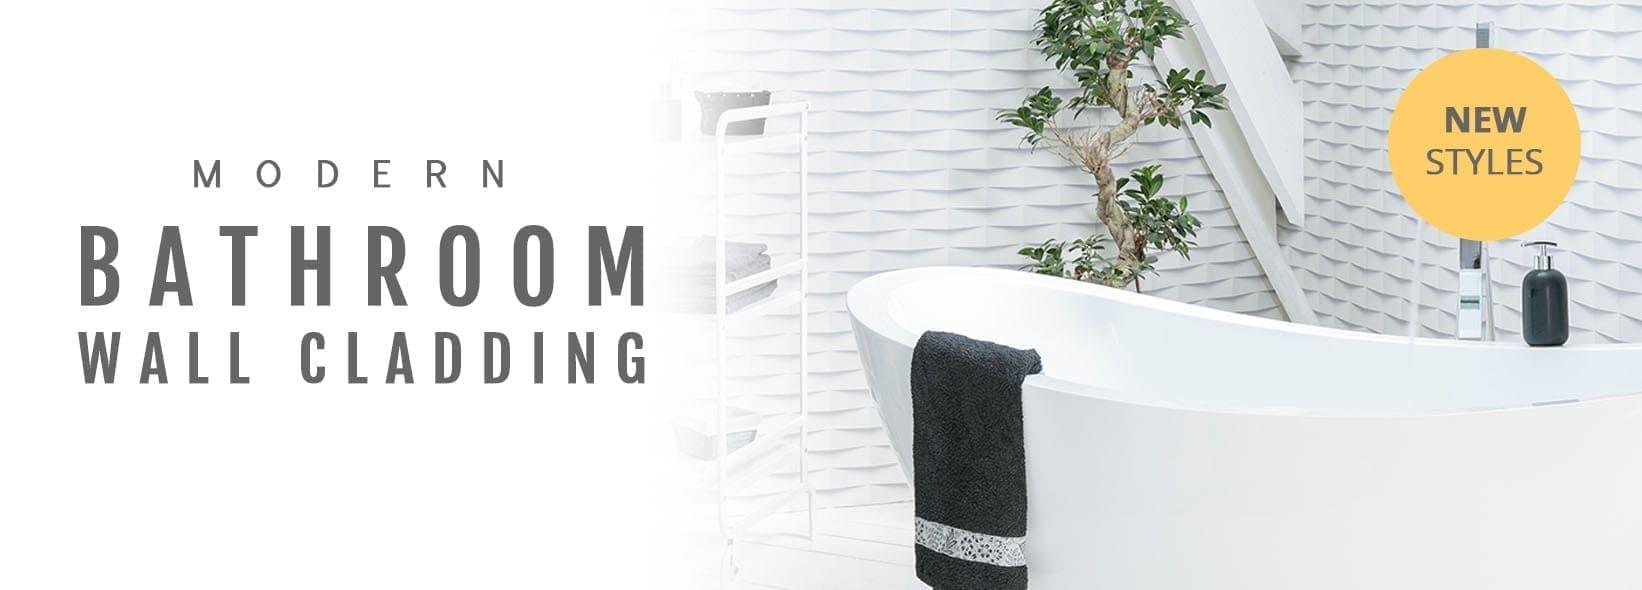 Bathroom Wall Cladding - Targwall